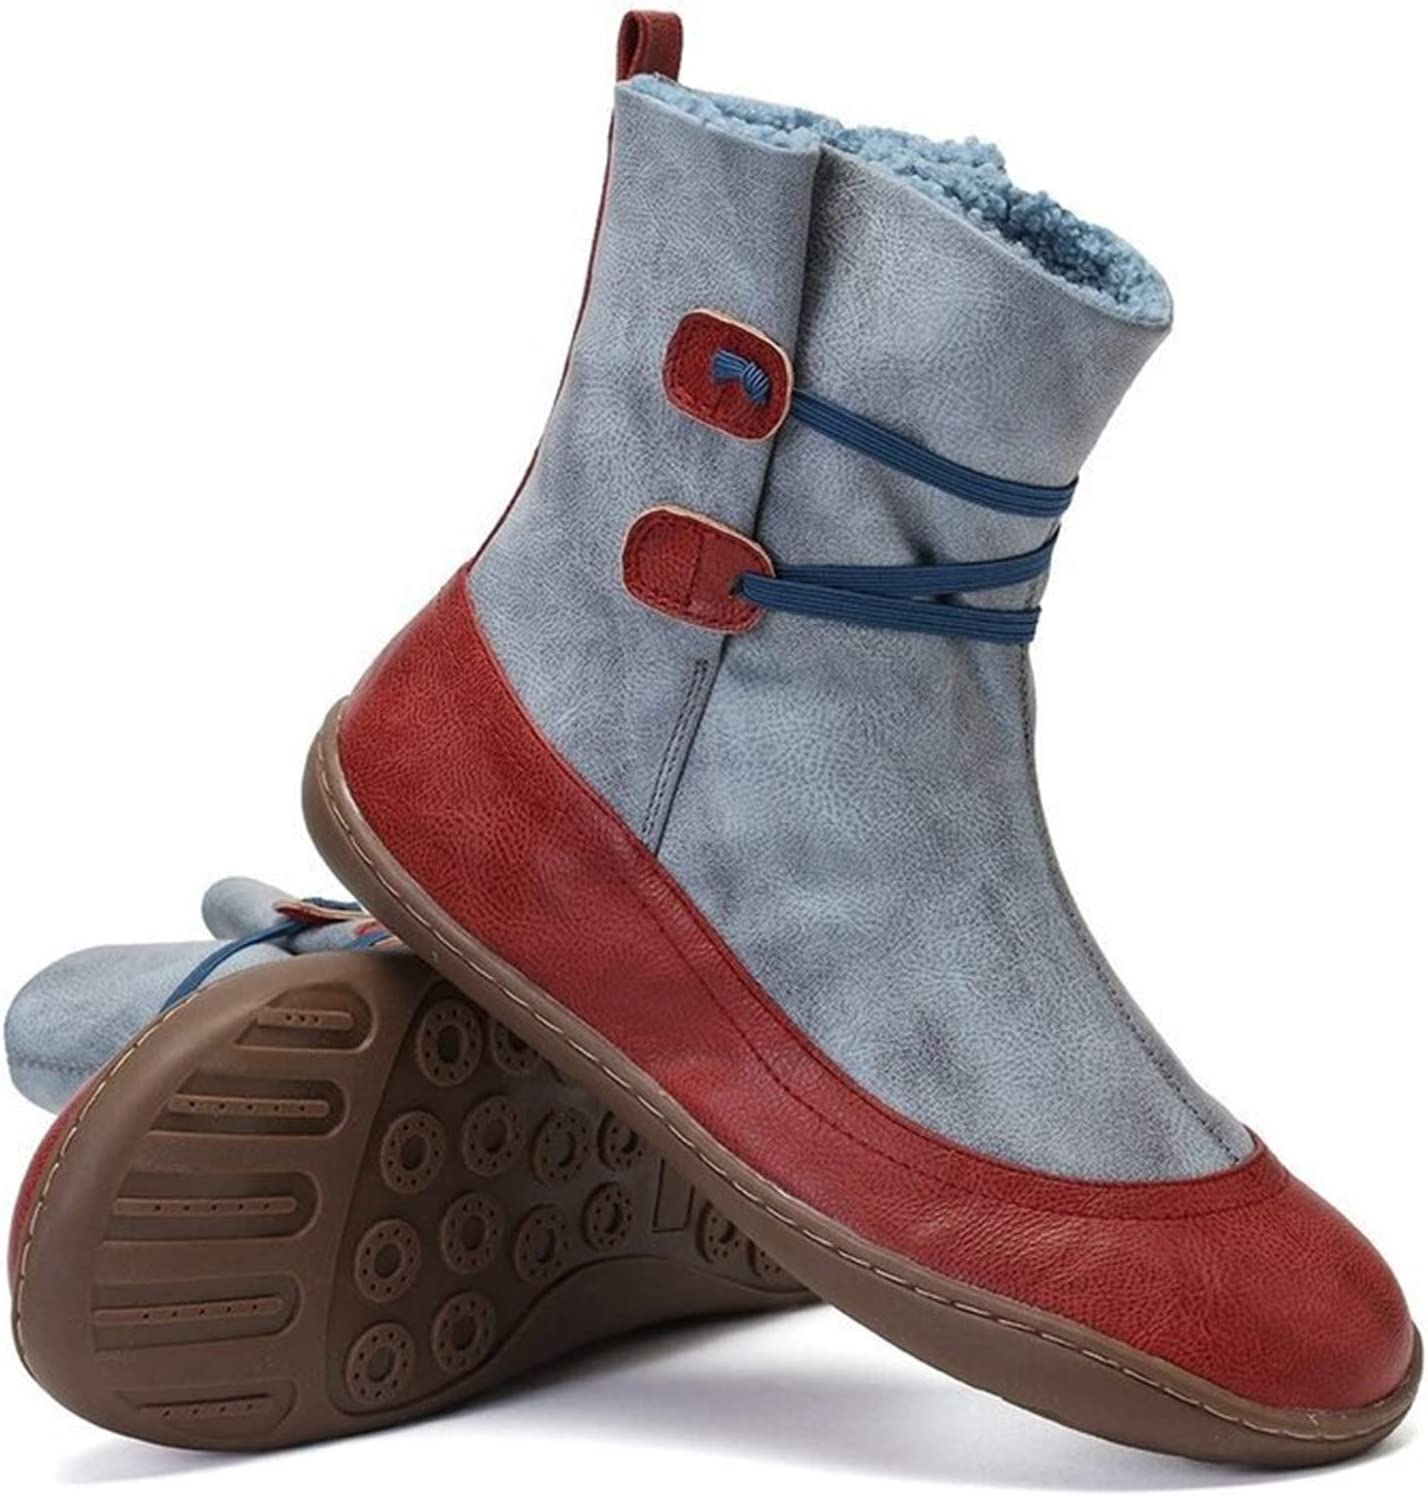 Womens Twin Button Faux Fur Waterproof Winter Snow Boots Splicing Leather Ankle Booties Anti Slip Outdoor Trekking Hiking Walking Shoes EU35-43,Gray,36